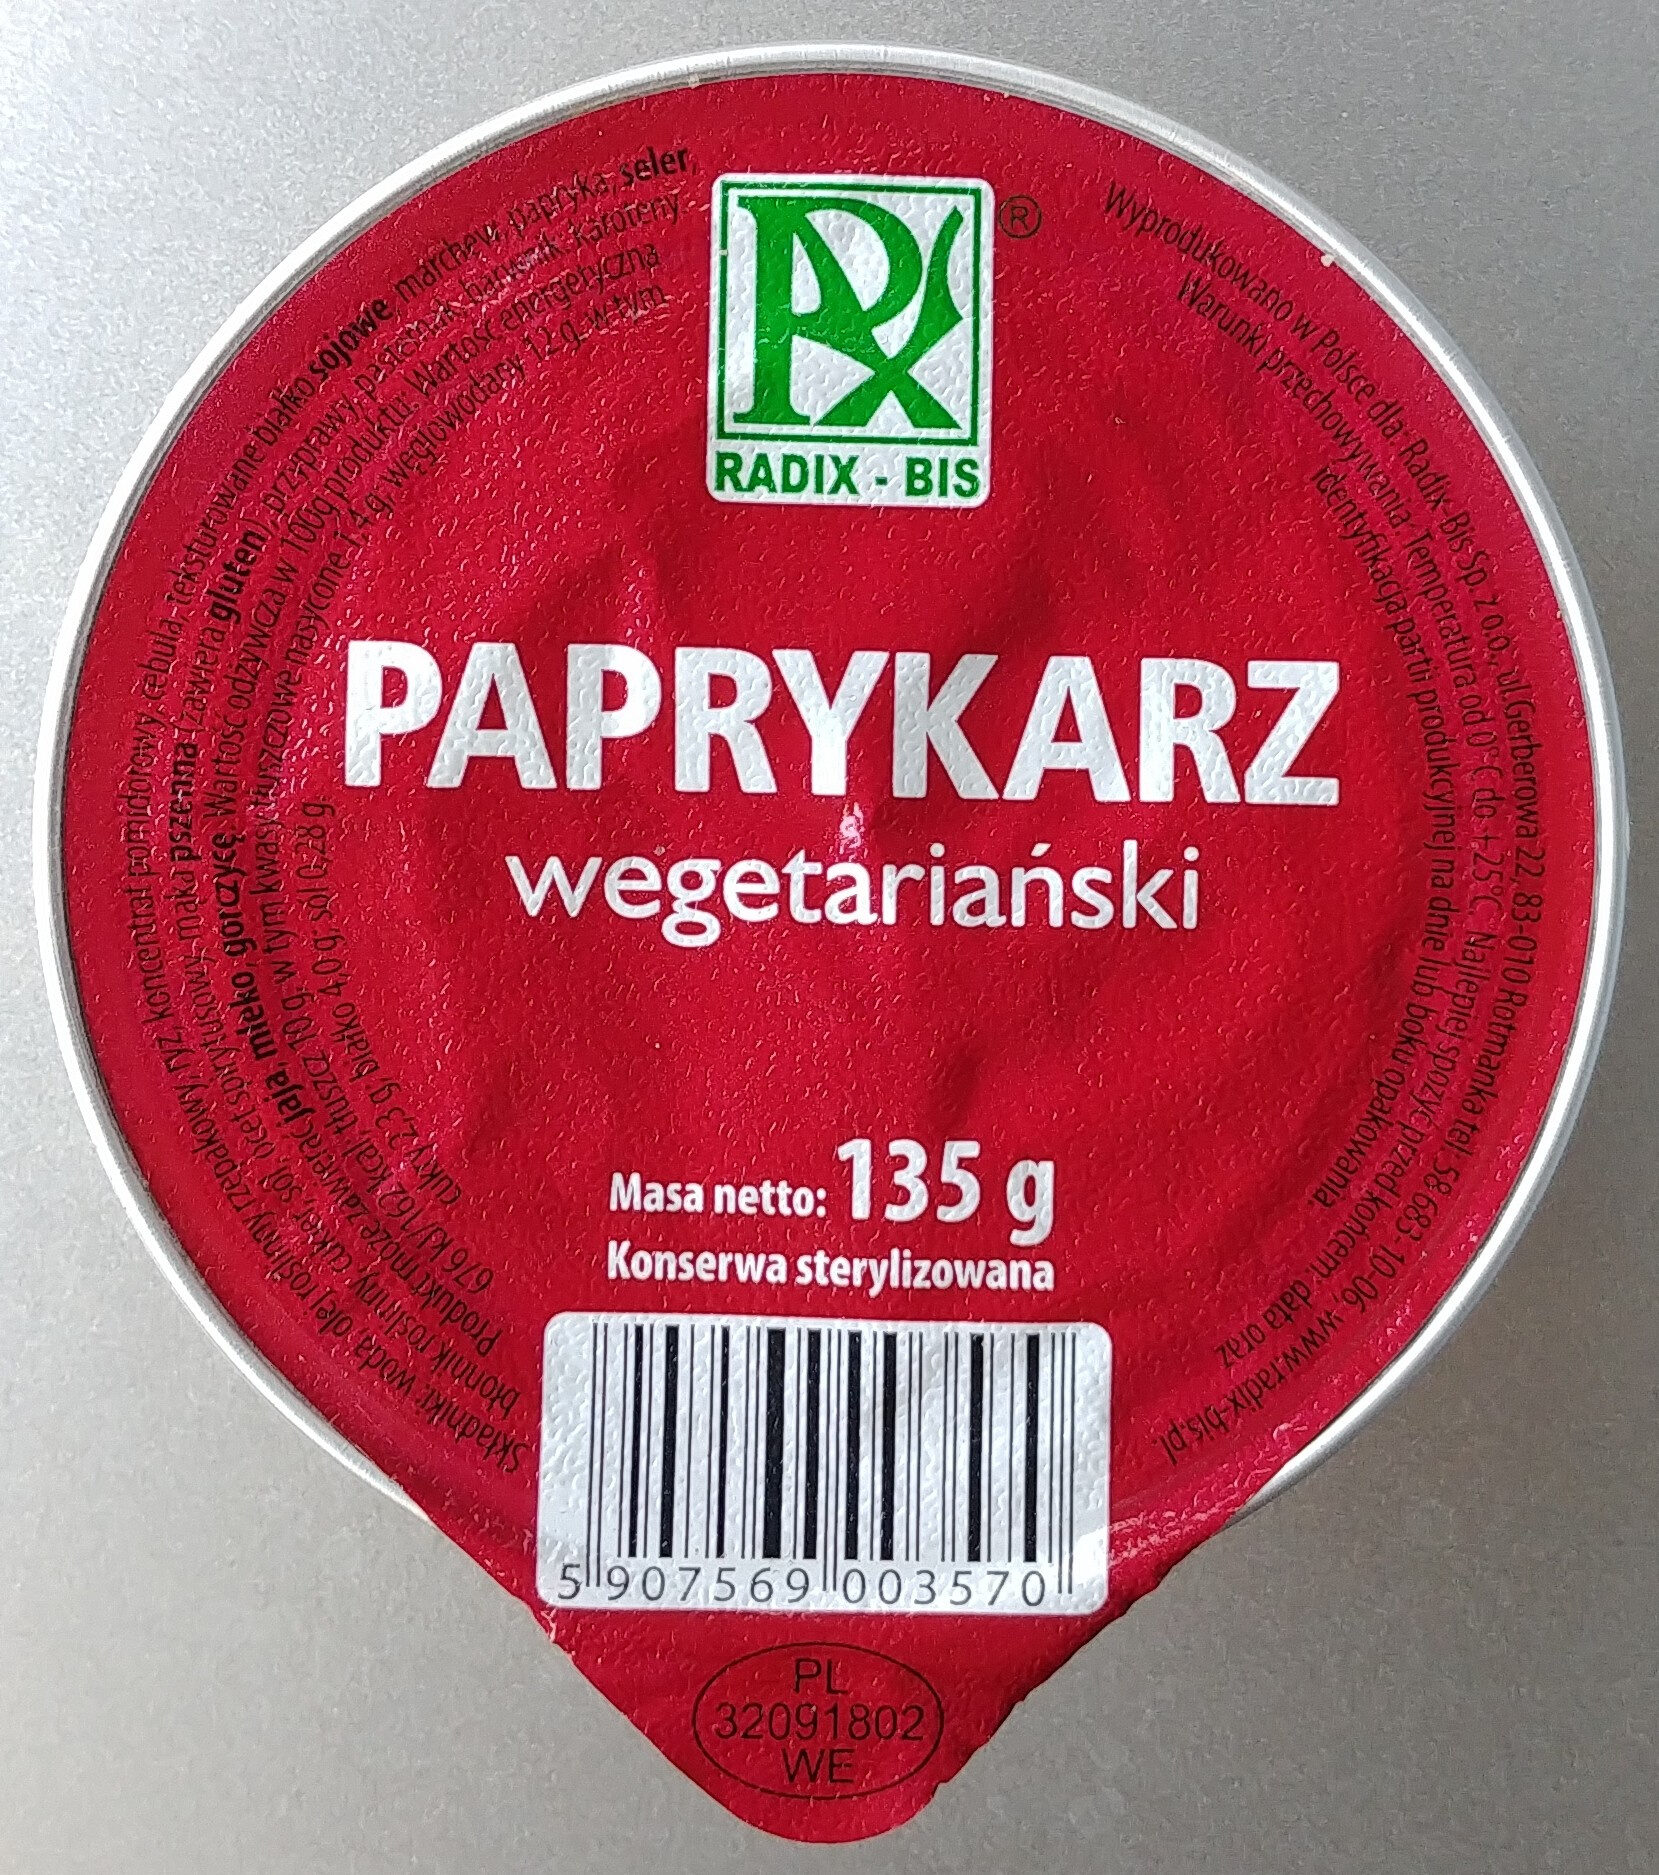 Paprykarz wegetariański. - Produkt - pl